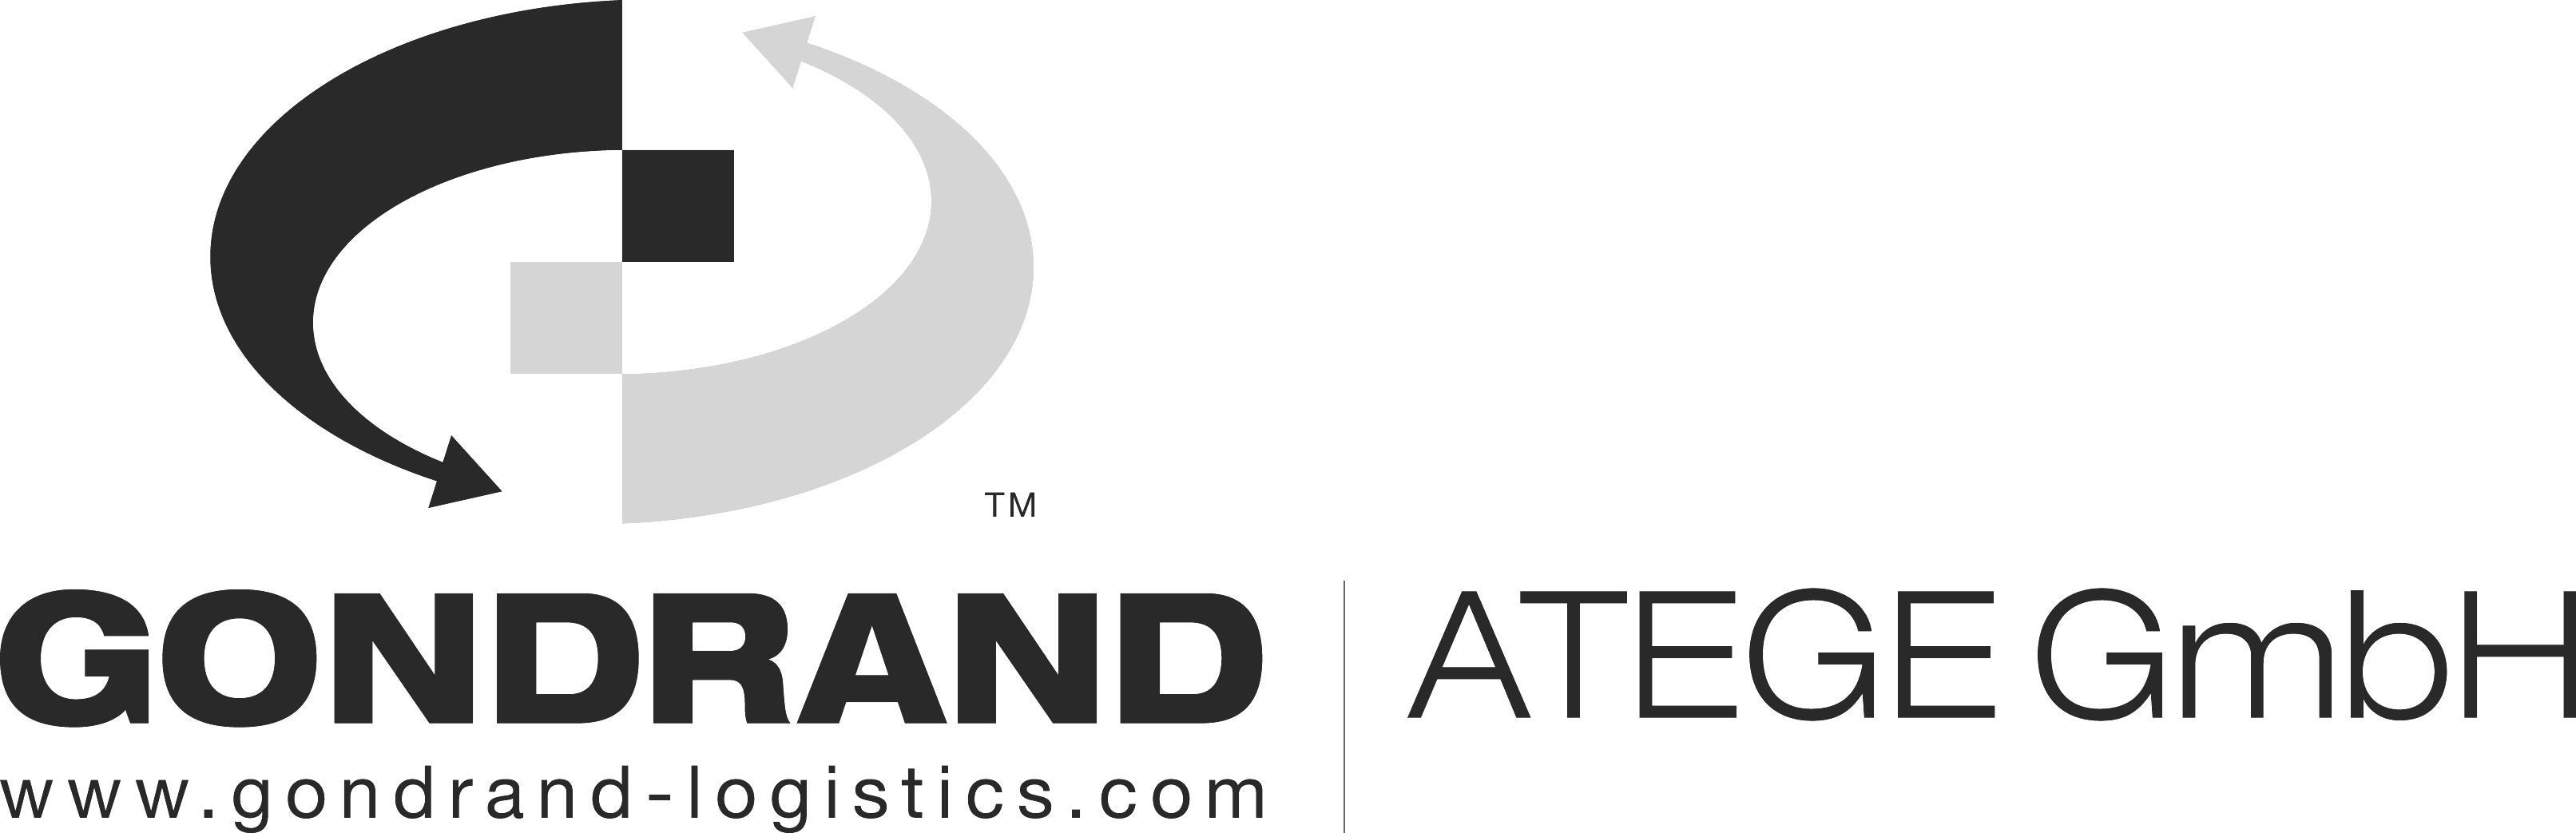 ETL-Transport_Referenzen_Gondrand-ATEGE-GmbH-blackwhite